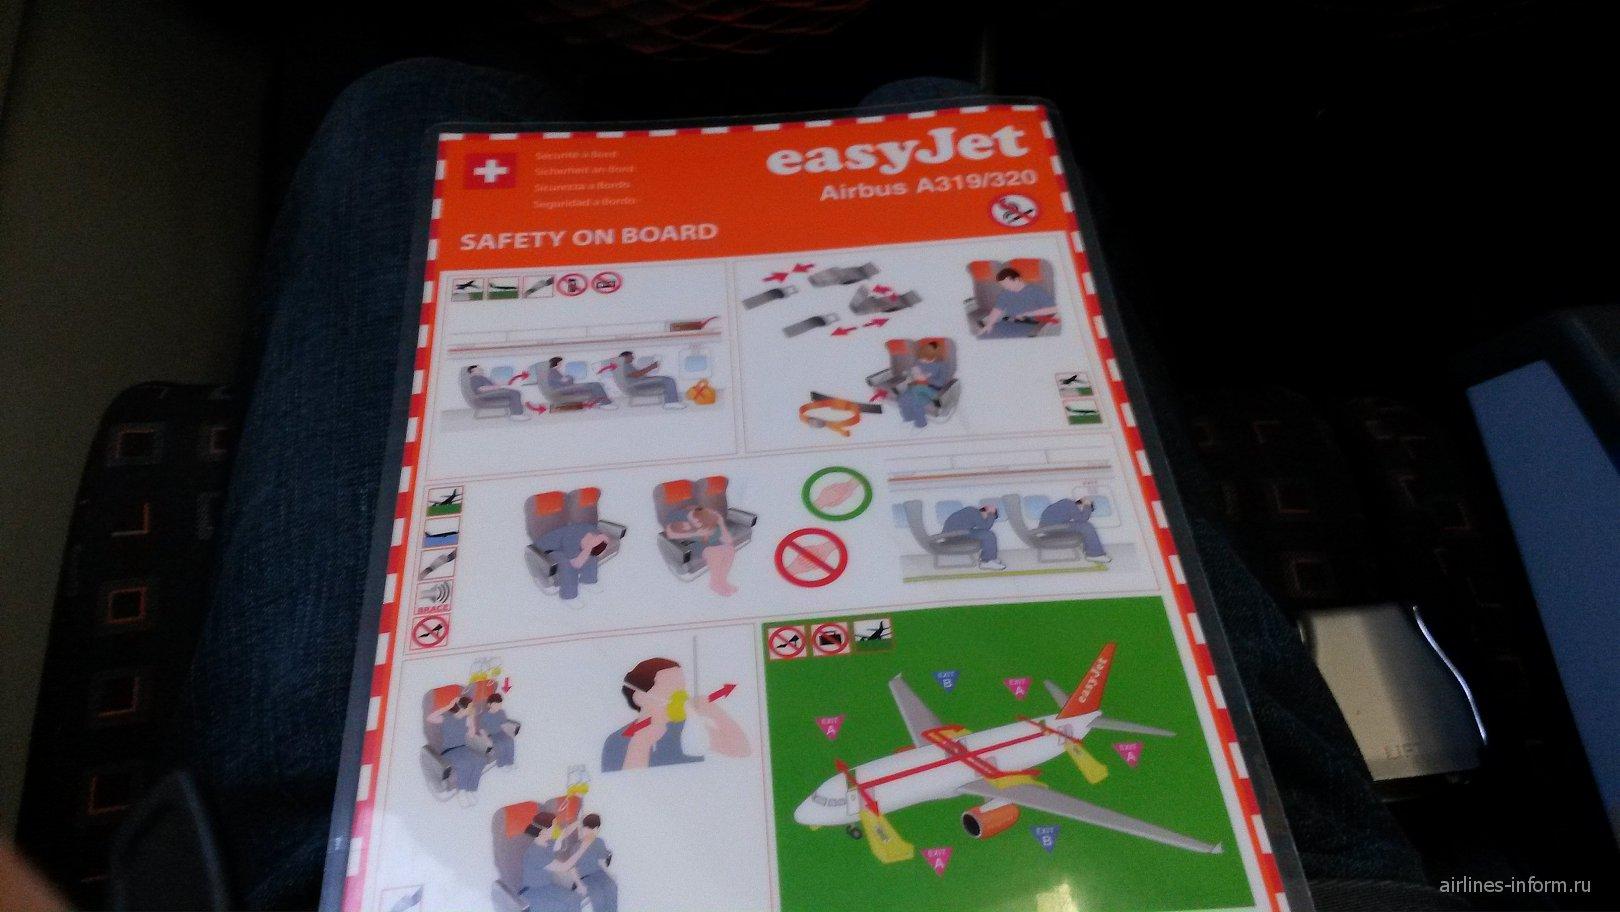 Airbus A319 авиакомпании easyJet